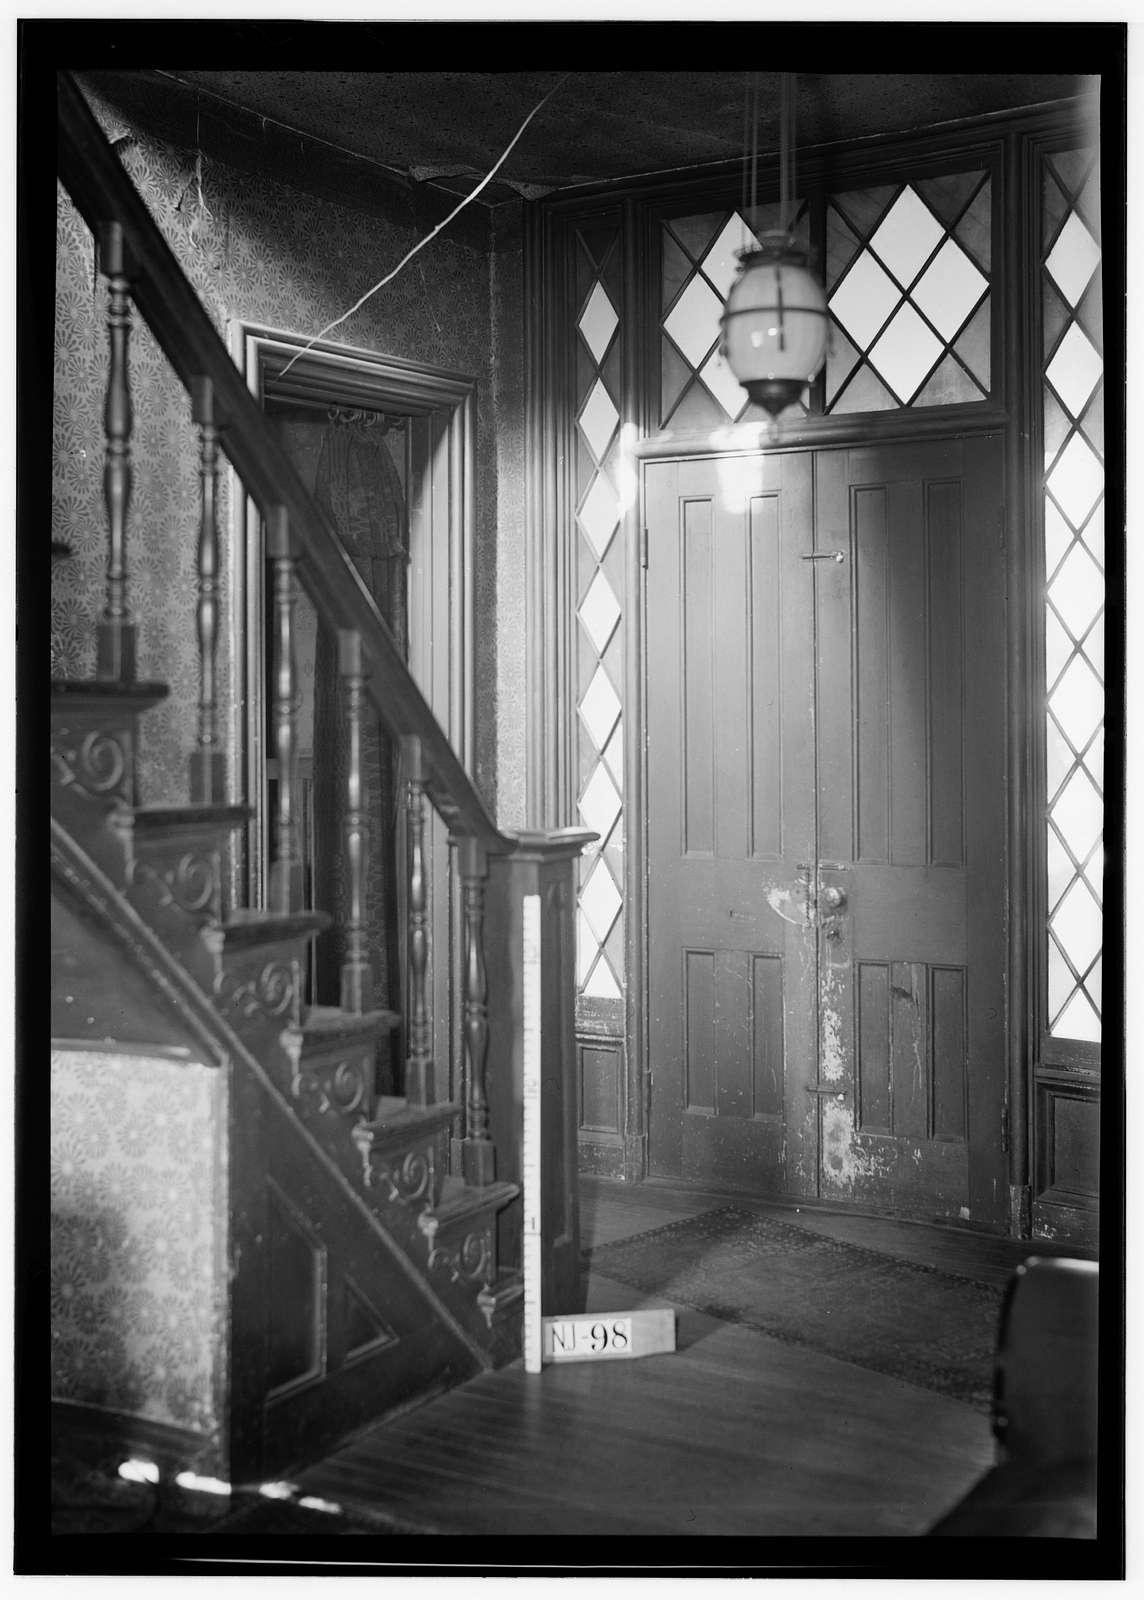 Hermitage, 335 North Franklin Turnpike, Ho-Ho-Kus, Bergen County, NJ